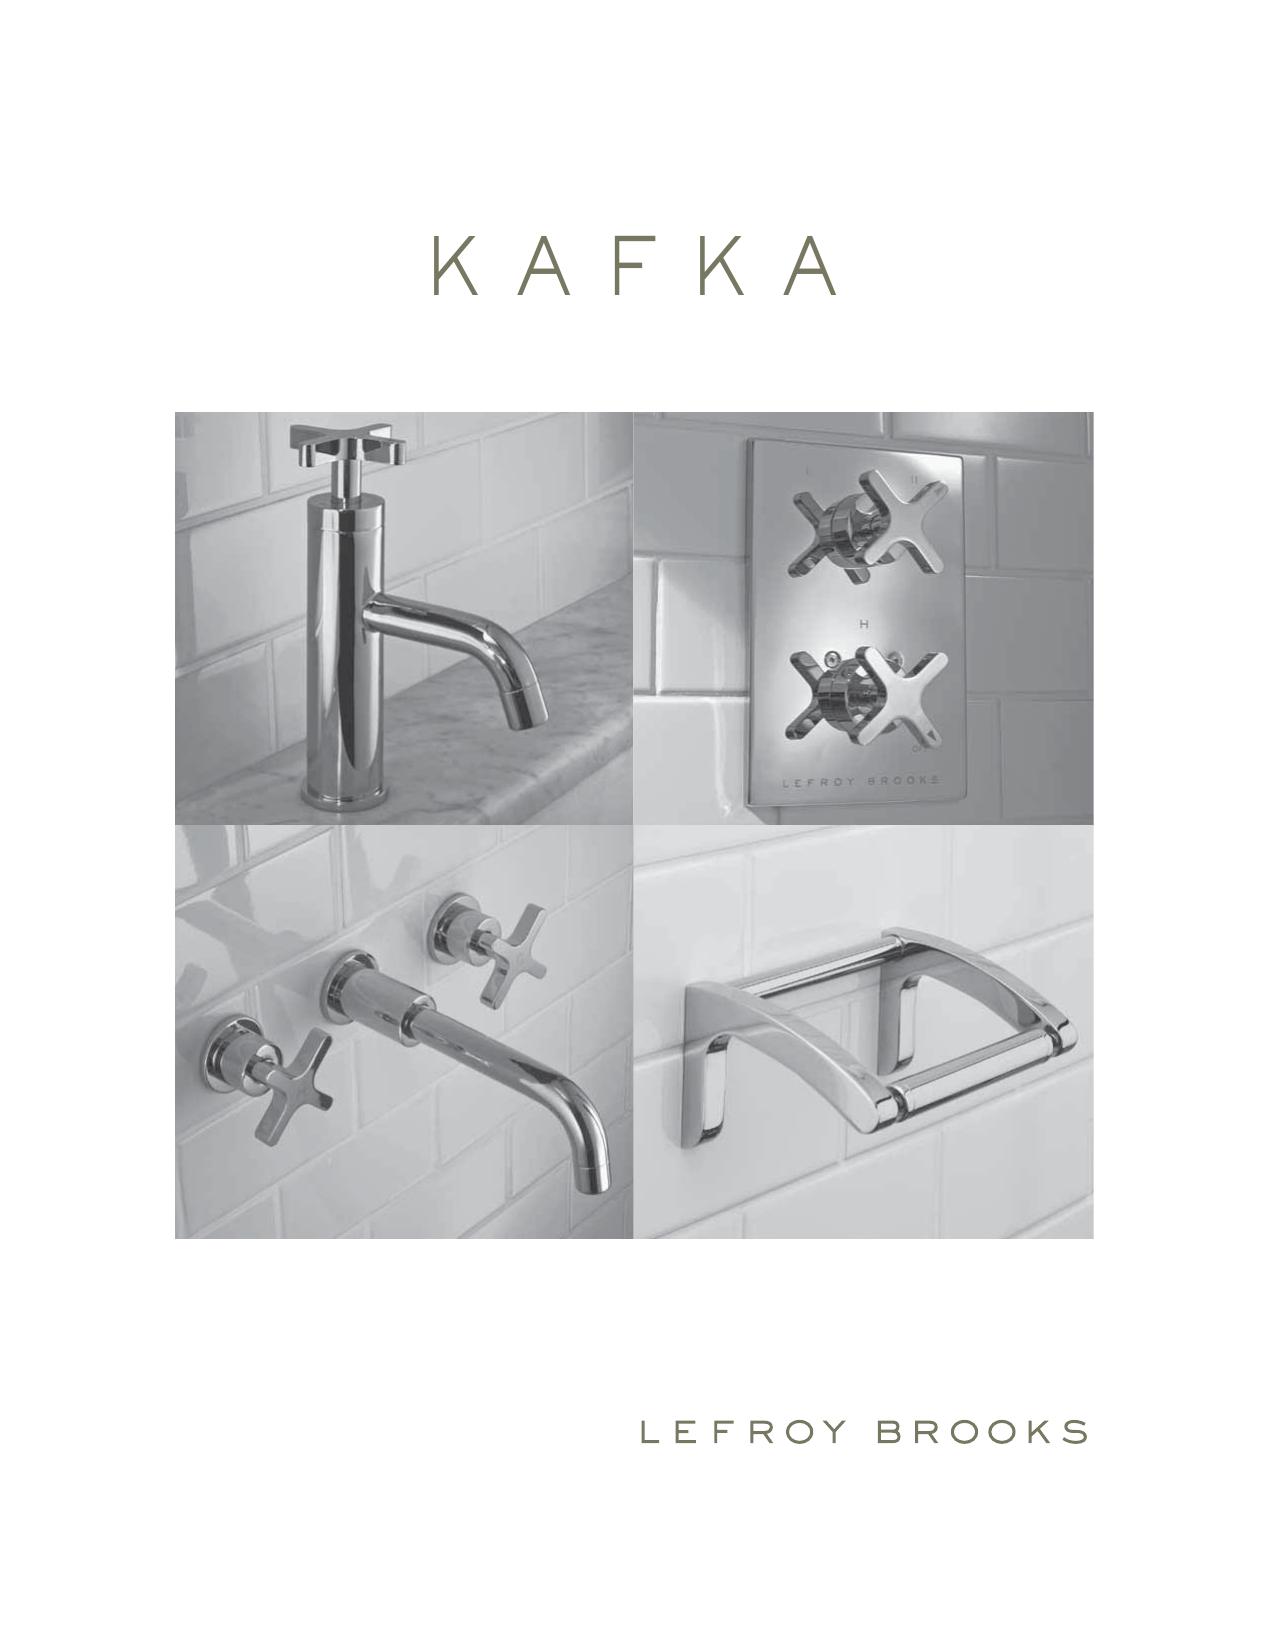 Kafka Lefroy Brooks Manualzz